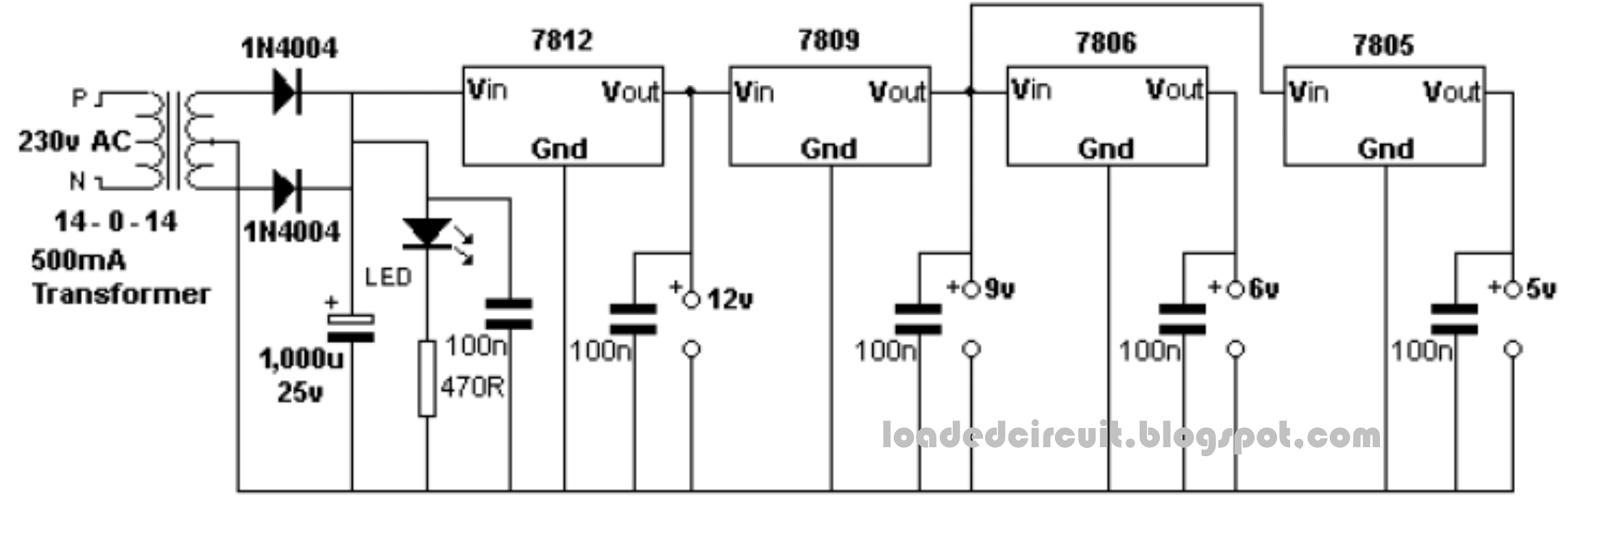 Loadedcircuitcom Um3561 Siren Generator Design Bench Power Supply